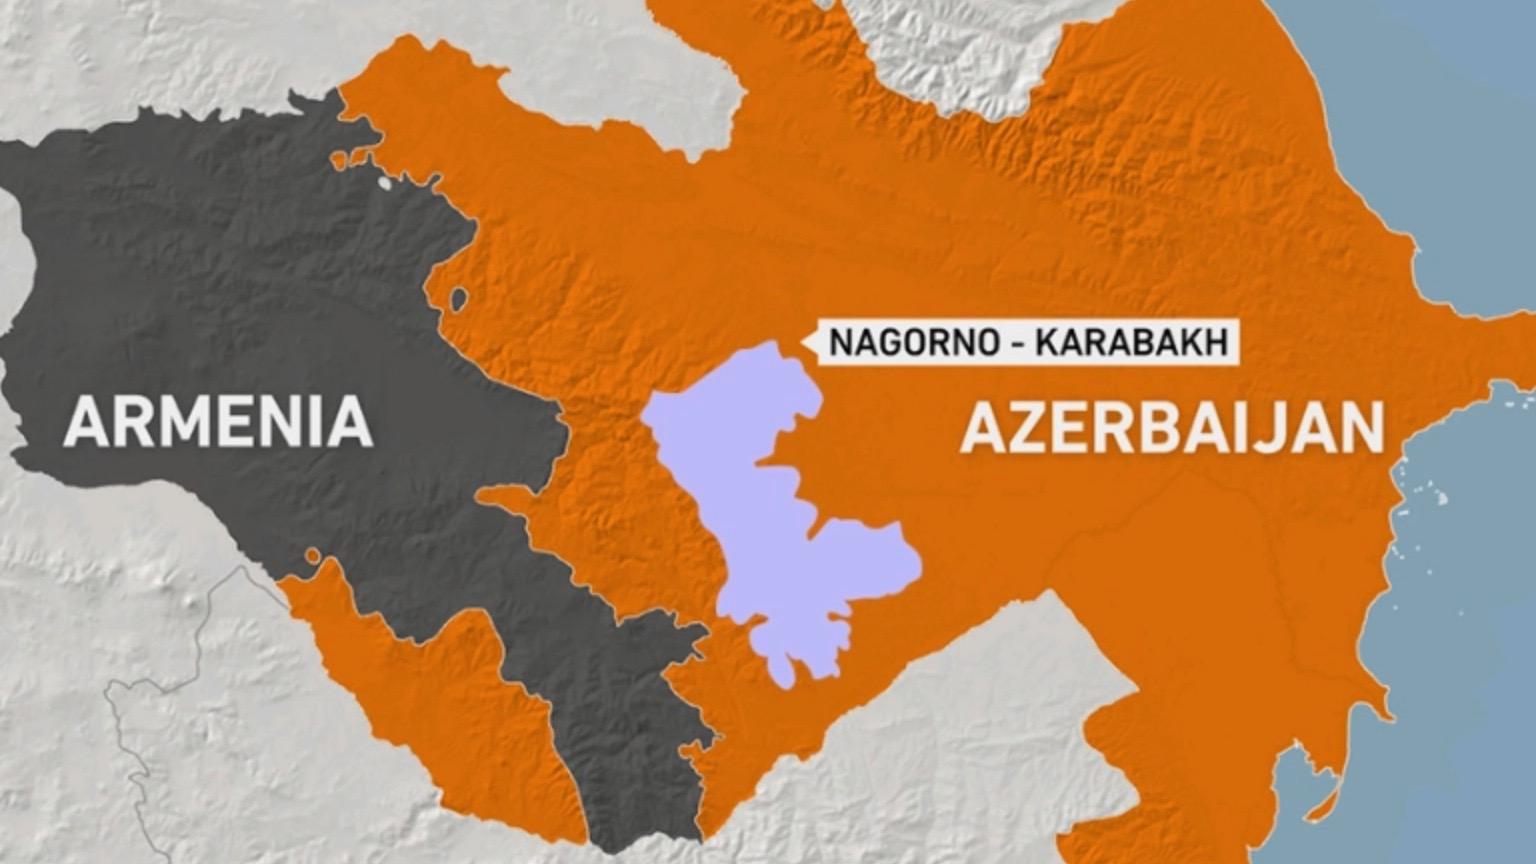 https://peoplesdispatch.org/wp-content/uploads/2020/09/armenia-azer.jpg